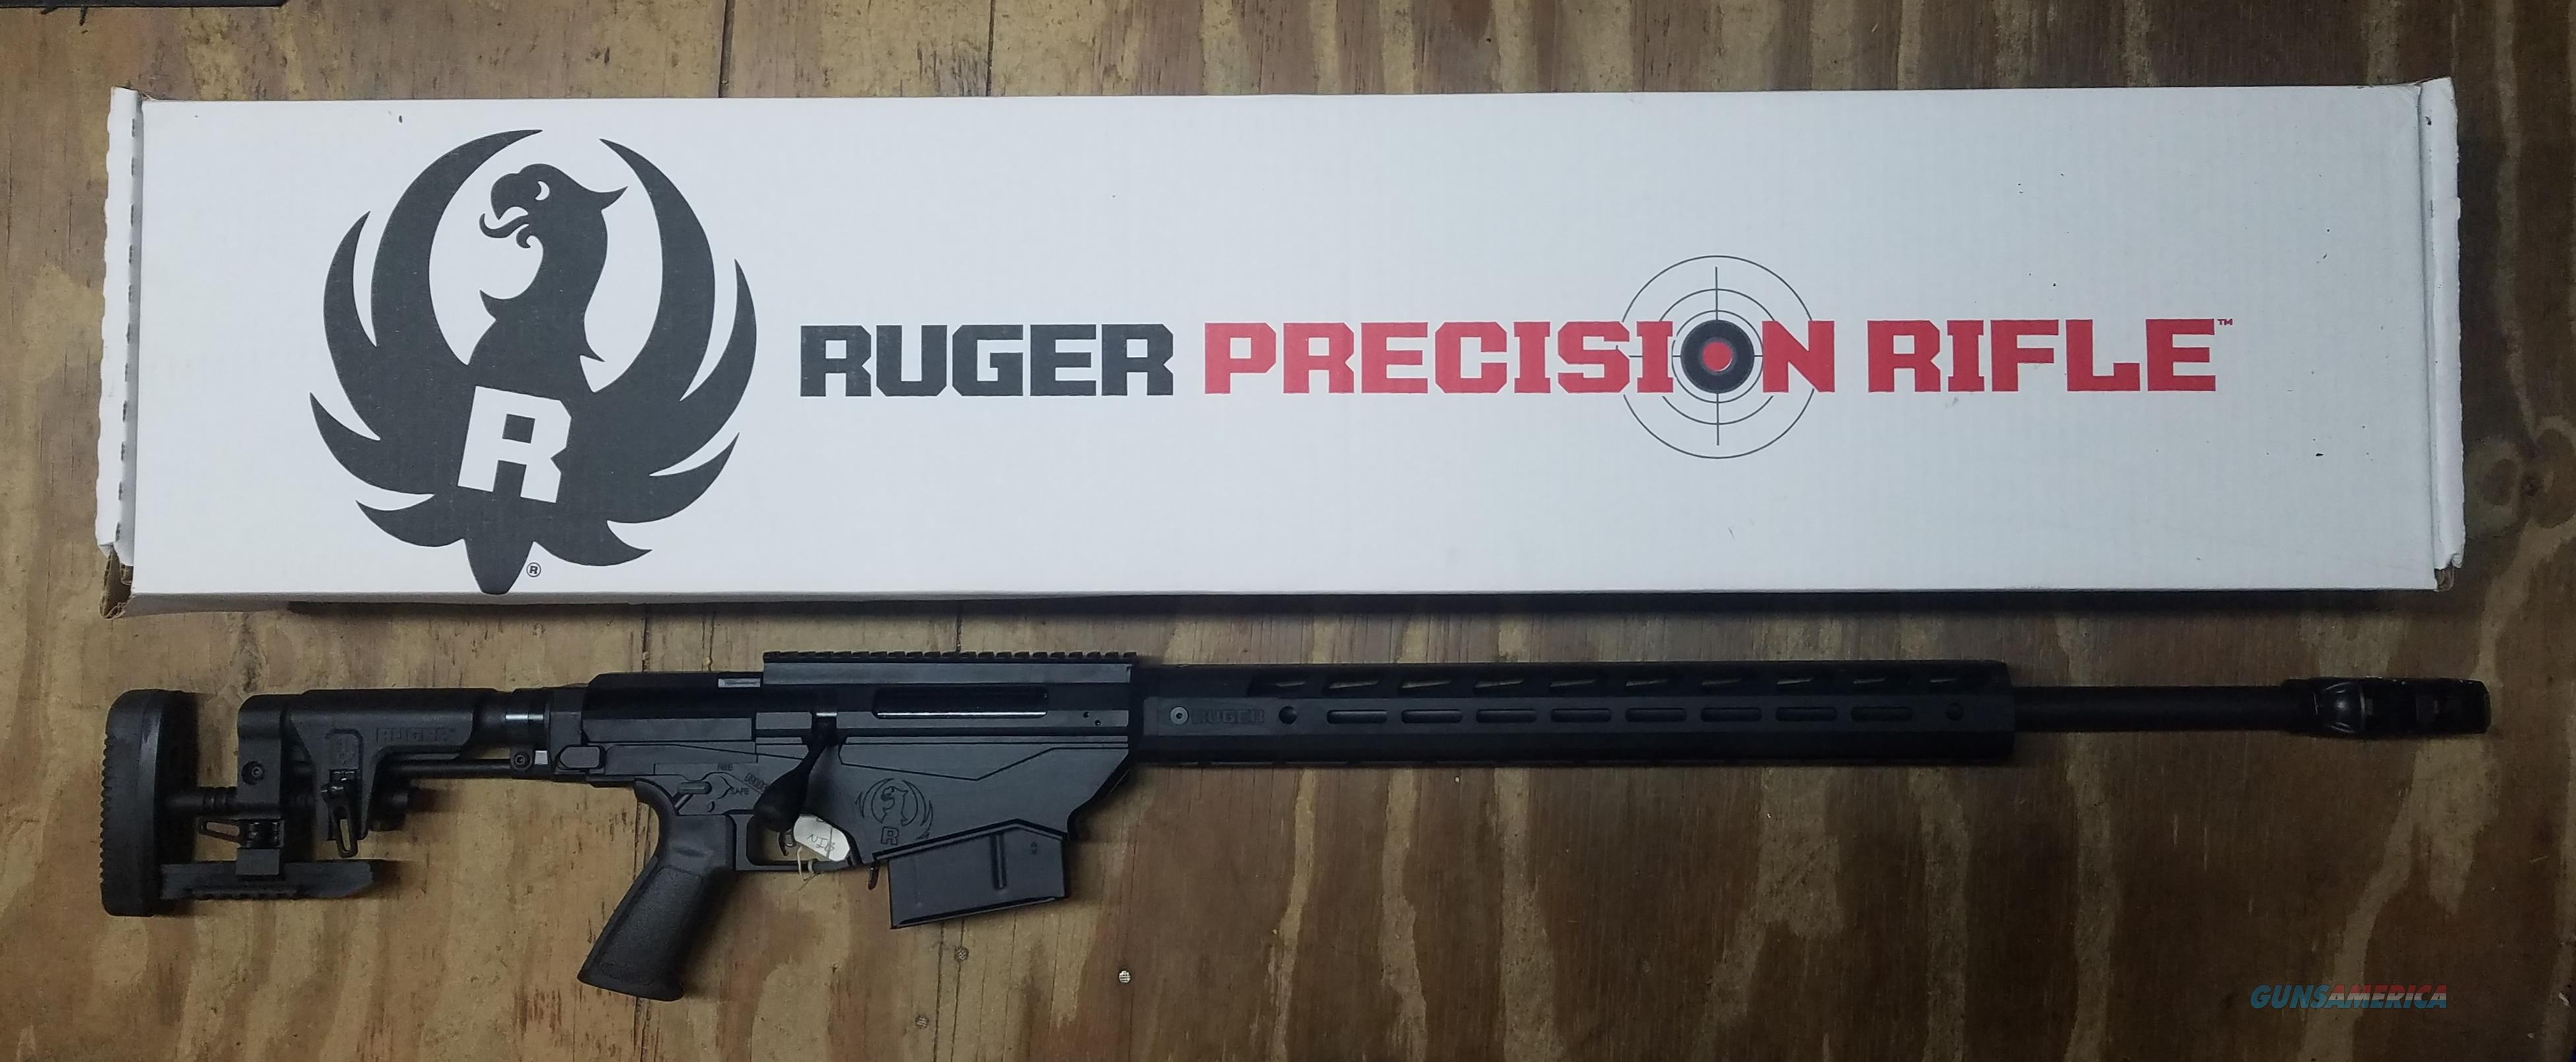 Ruger Precision Rifle .300 Win Mag Model 18081  Guns > Rifles > Ruger Rifles > Precision Rifle Series